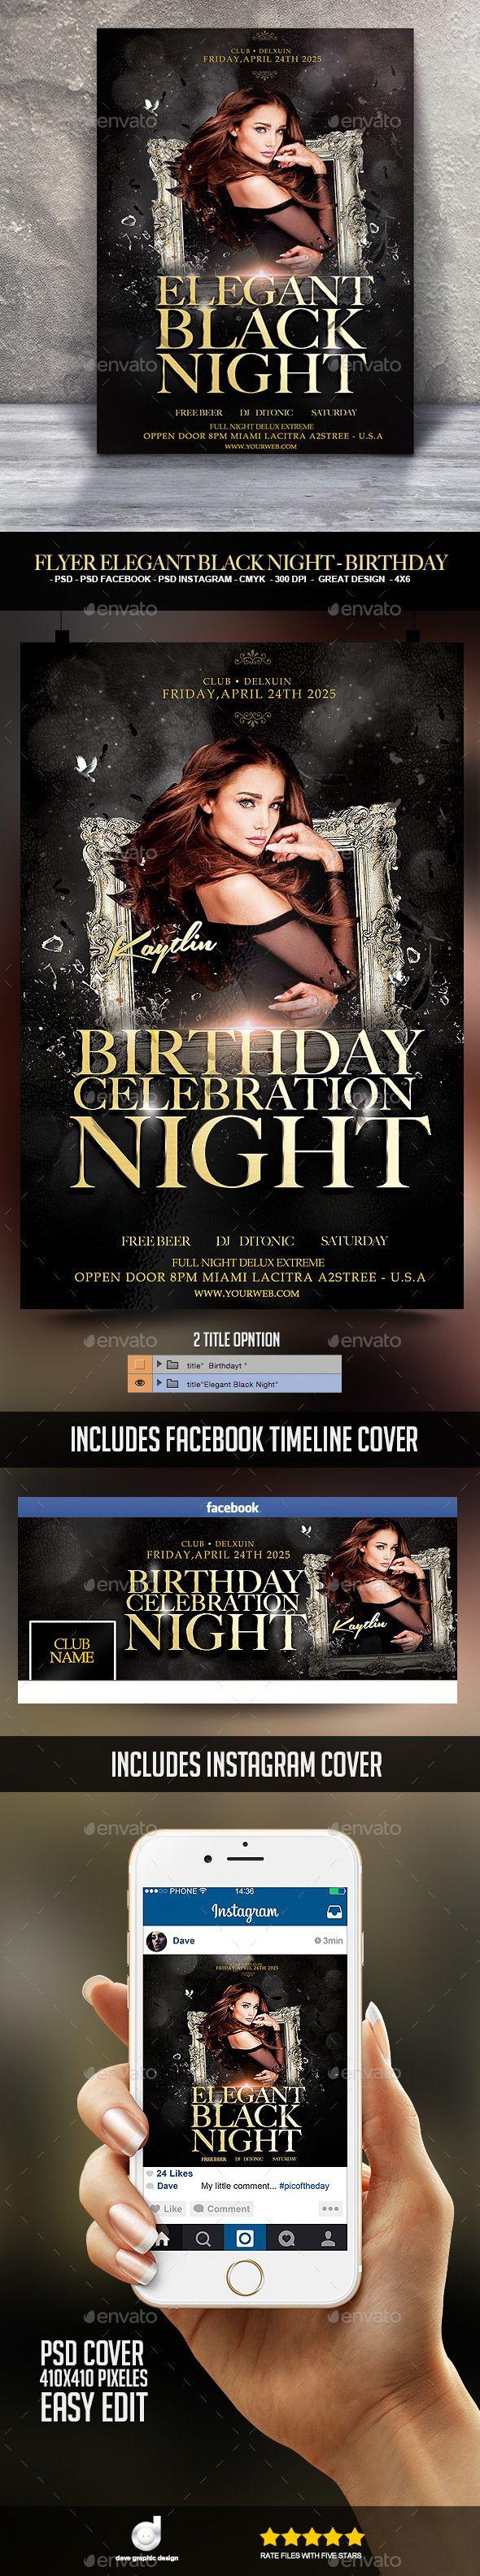 Flyer Elegant Black Night  Birthday  Download Heres And Flyer